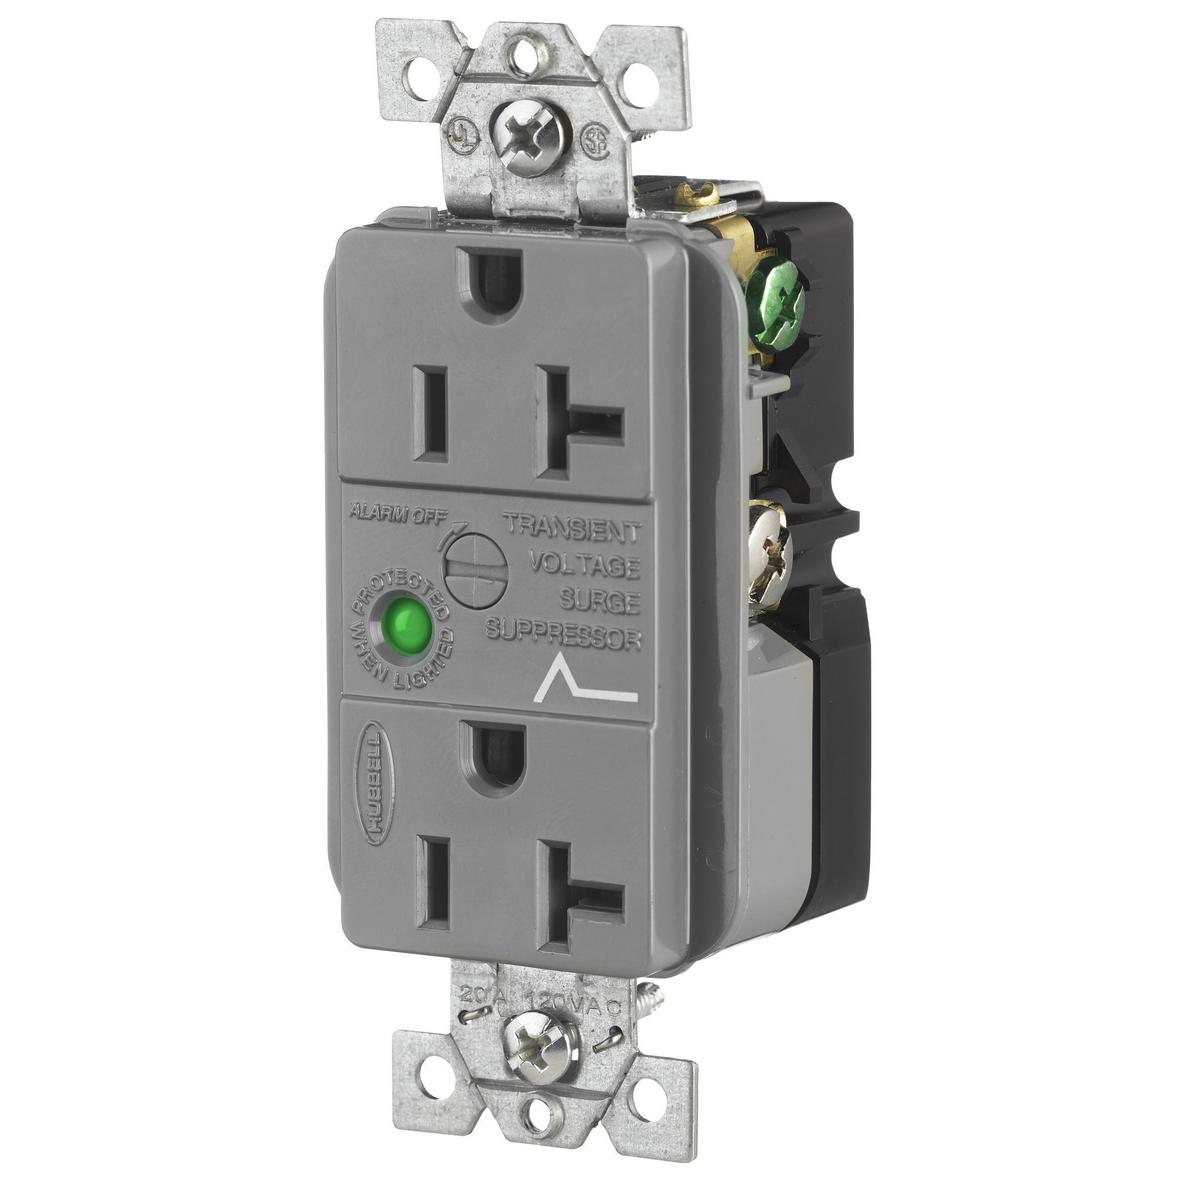 Hubbell HBL5362GYSA 20 Amp 125 Volt 2-Pole 3-Wire NEMA 5-20R Gray Duplex Surge Suppression Receptacle